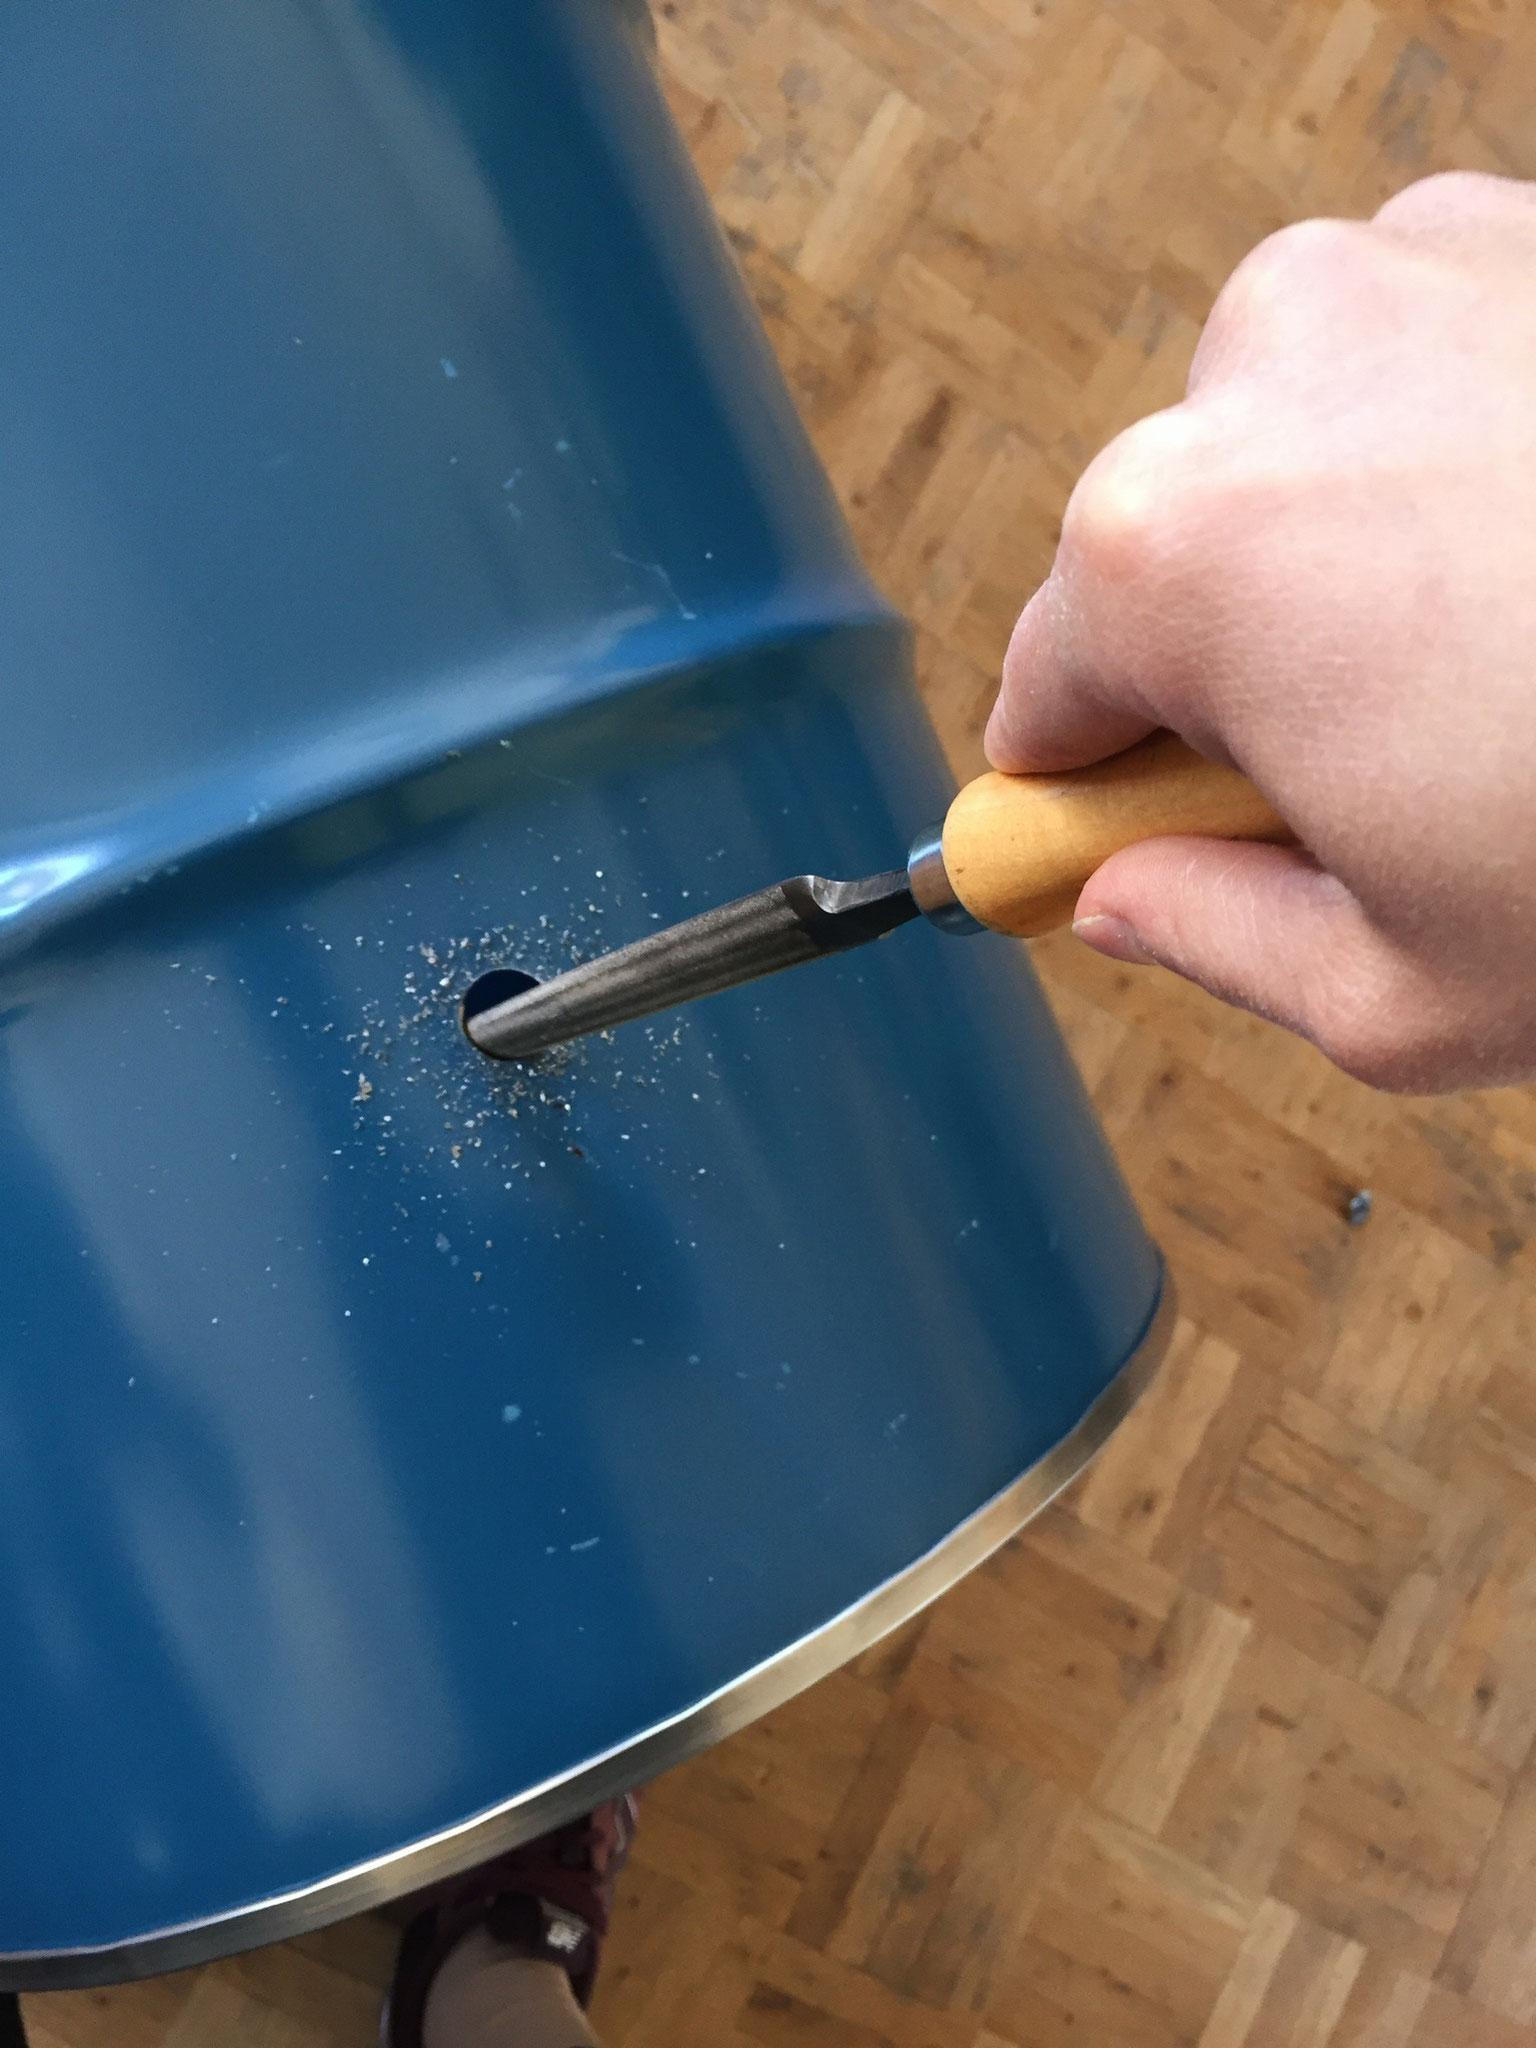 blog upcycling regentonne buitig do it yourself heimwerken. Black Bedroom Furniture Sets. Home Design Ideas